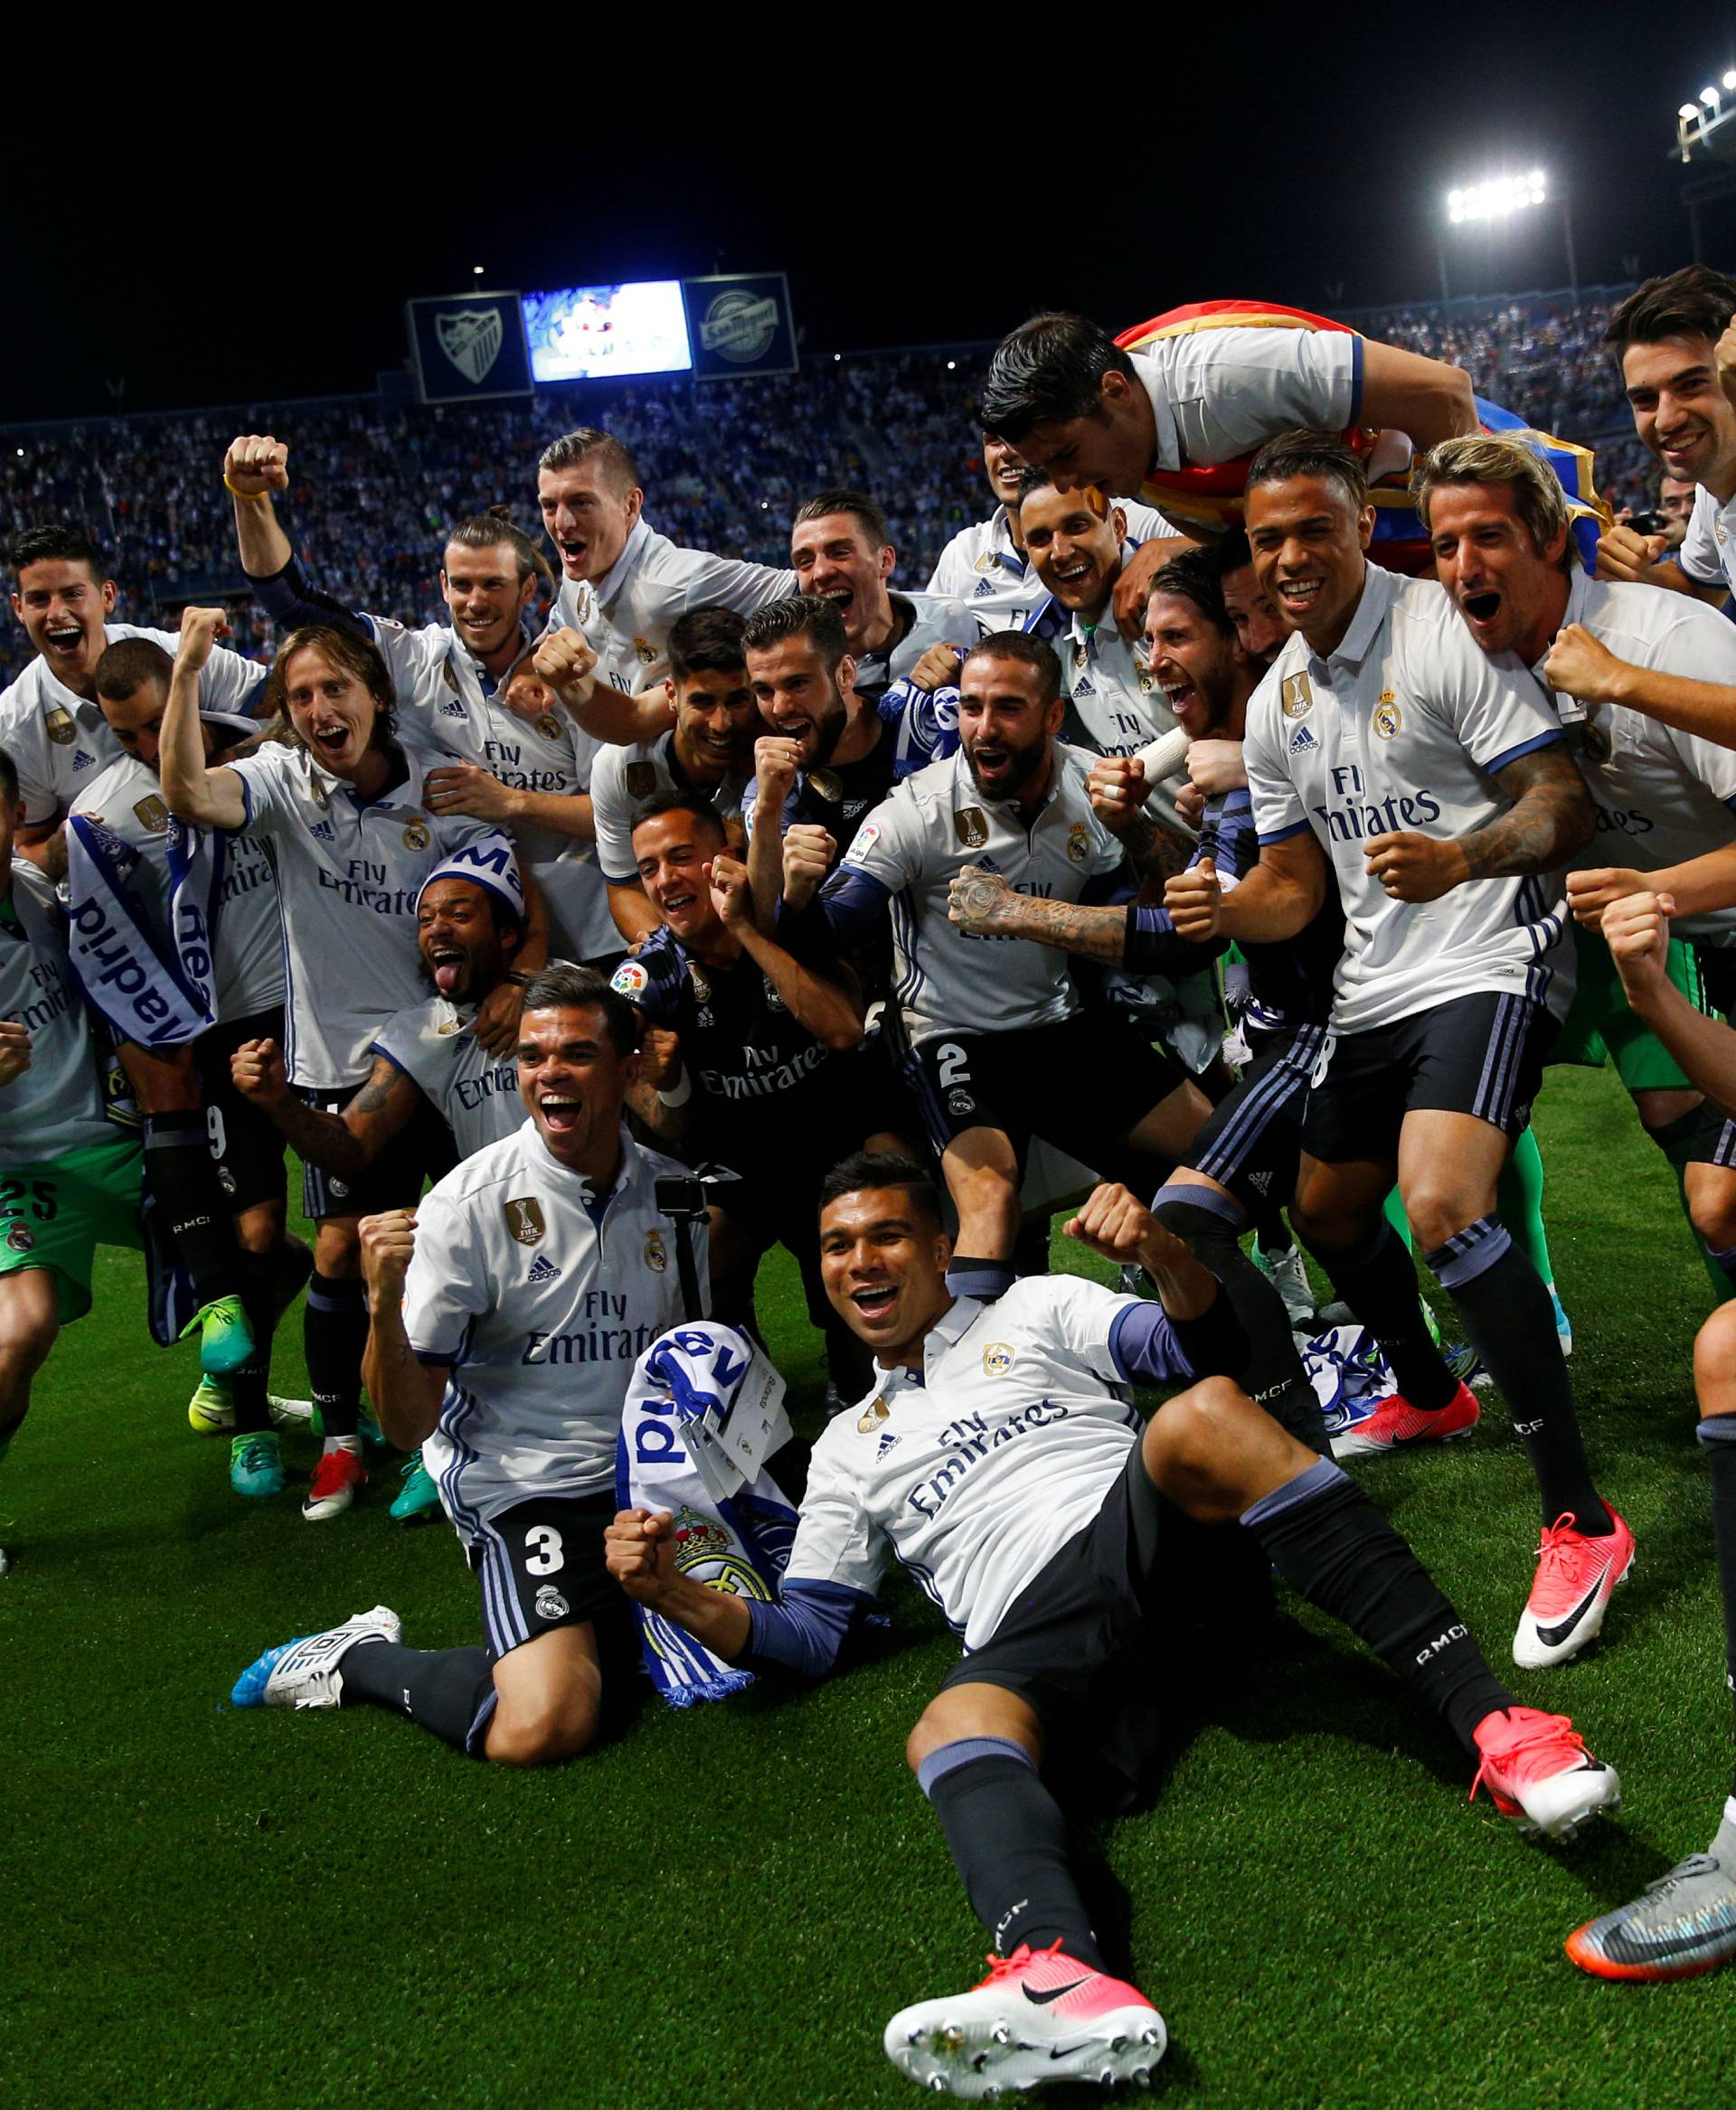 Malaga v Real Madrid - Spanish Liga Santander